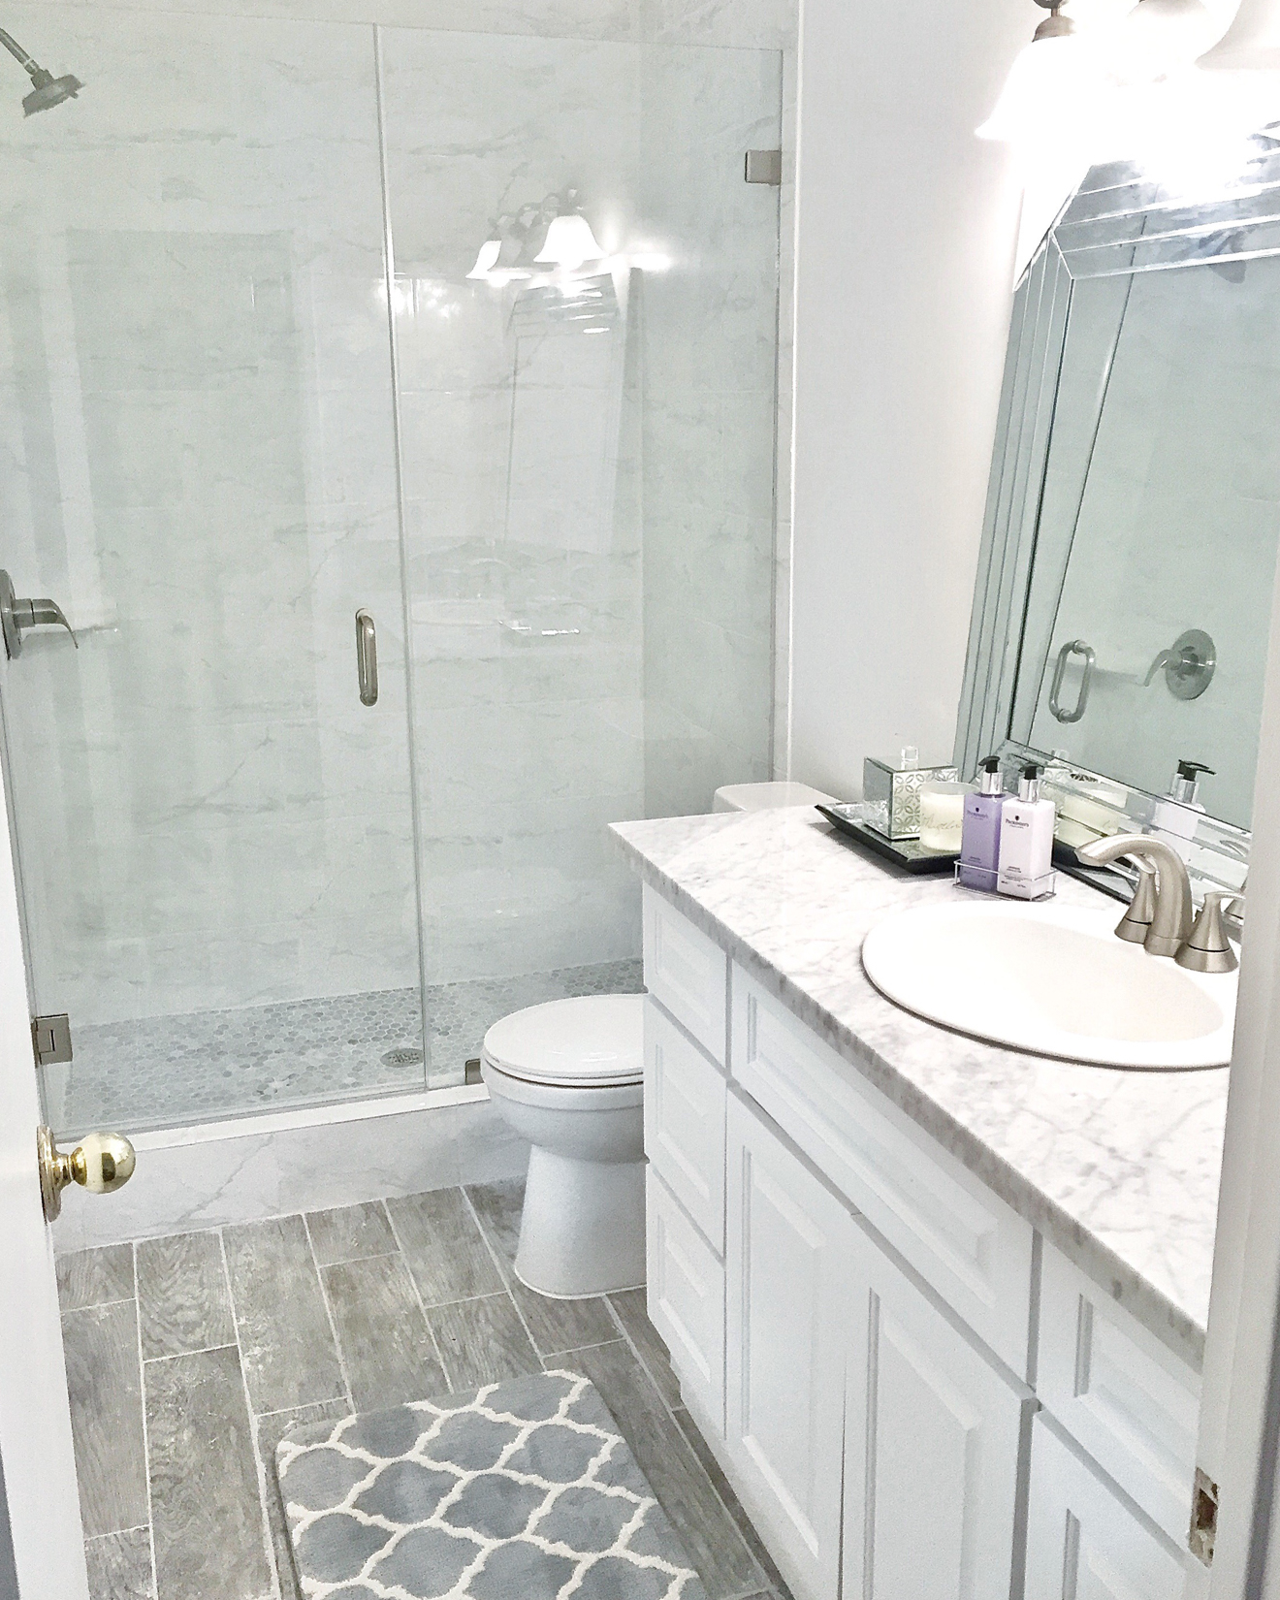 Modern Bathroom Remodel Ideas   Home Decor   Laura Lily on Small Bathroom Remodel Ideas 2019  id=77615